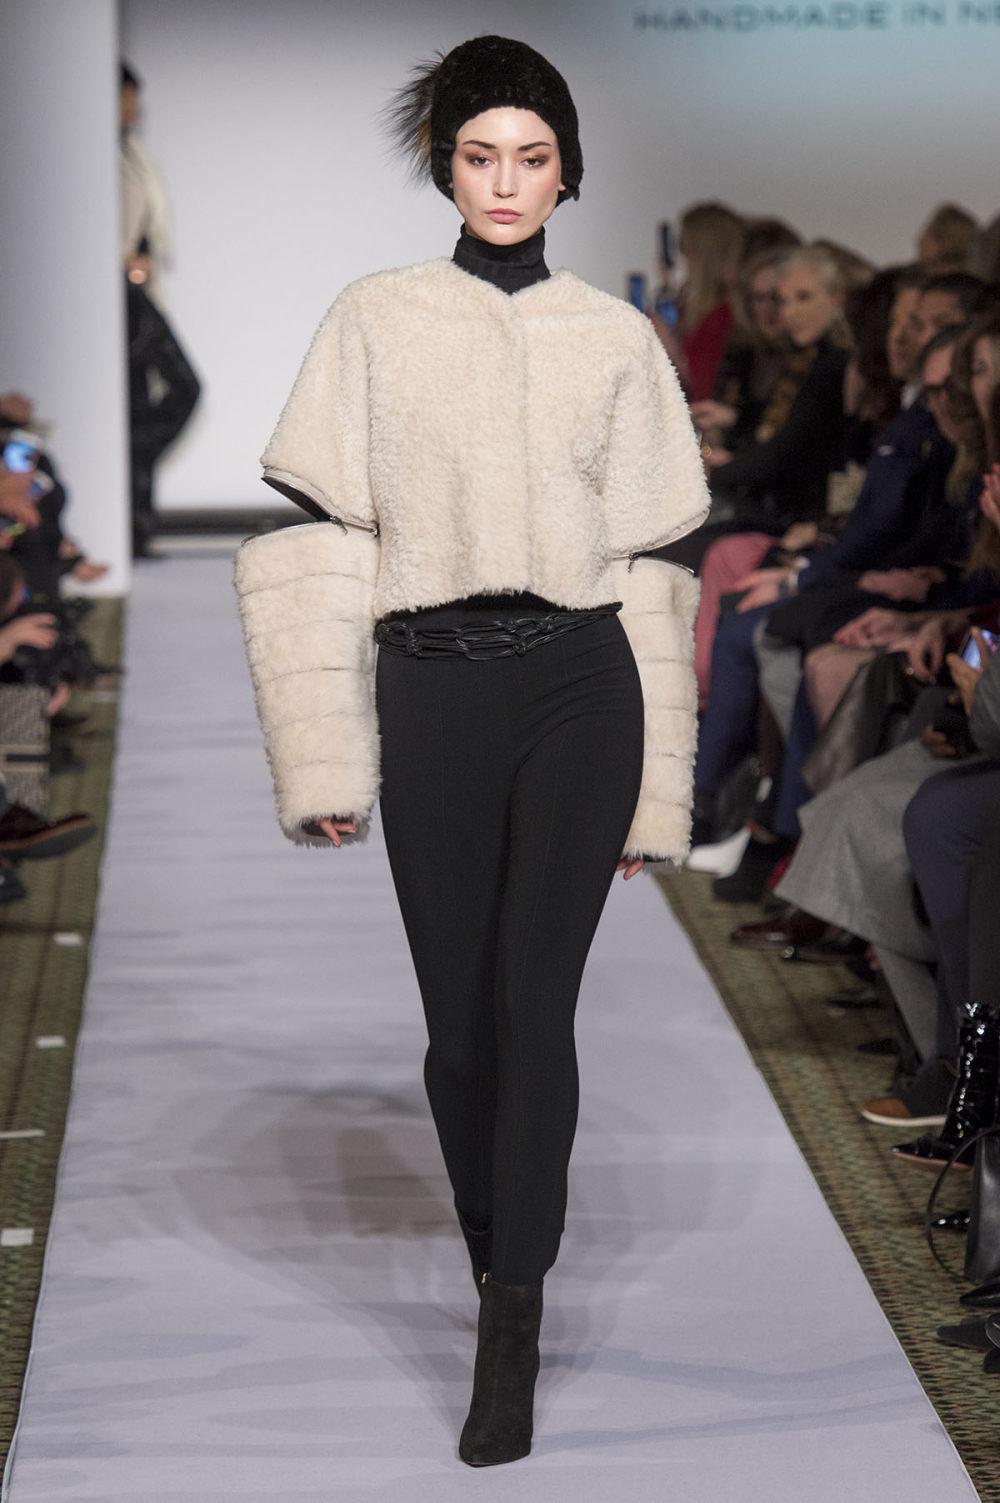 Carolina Herrera时装系列用鲜艳的颜色充满智能的黑白色调-15.jpg